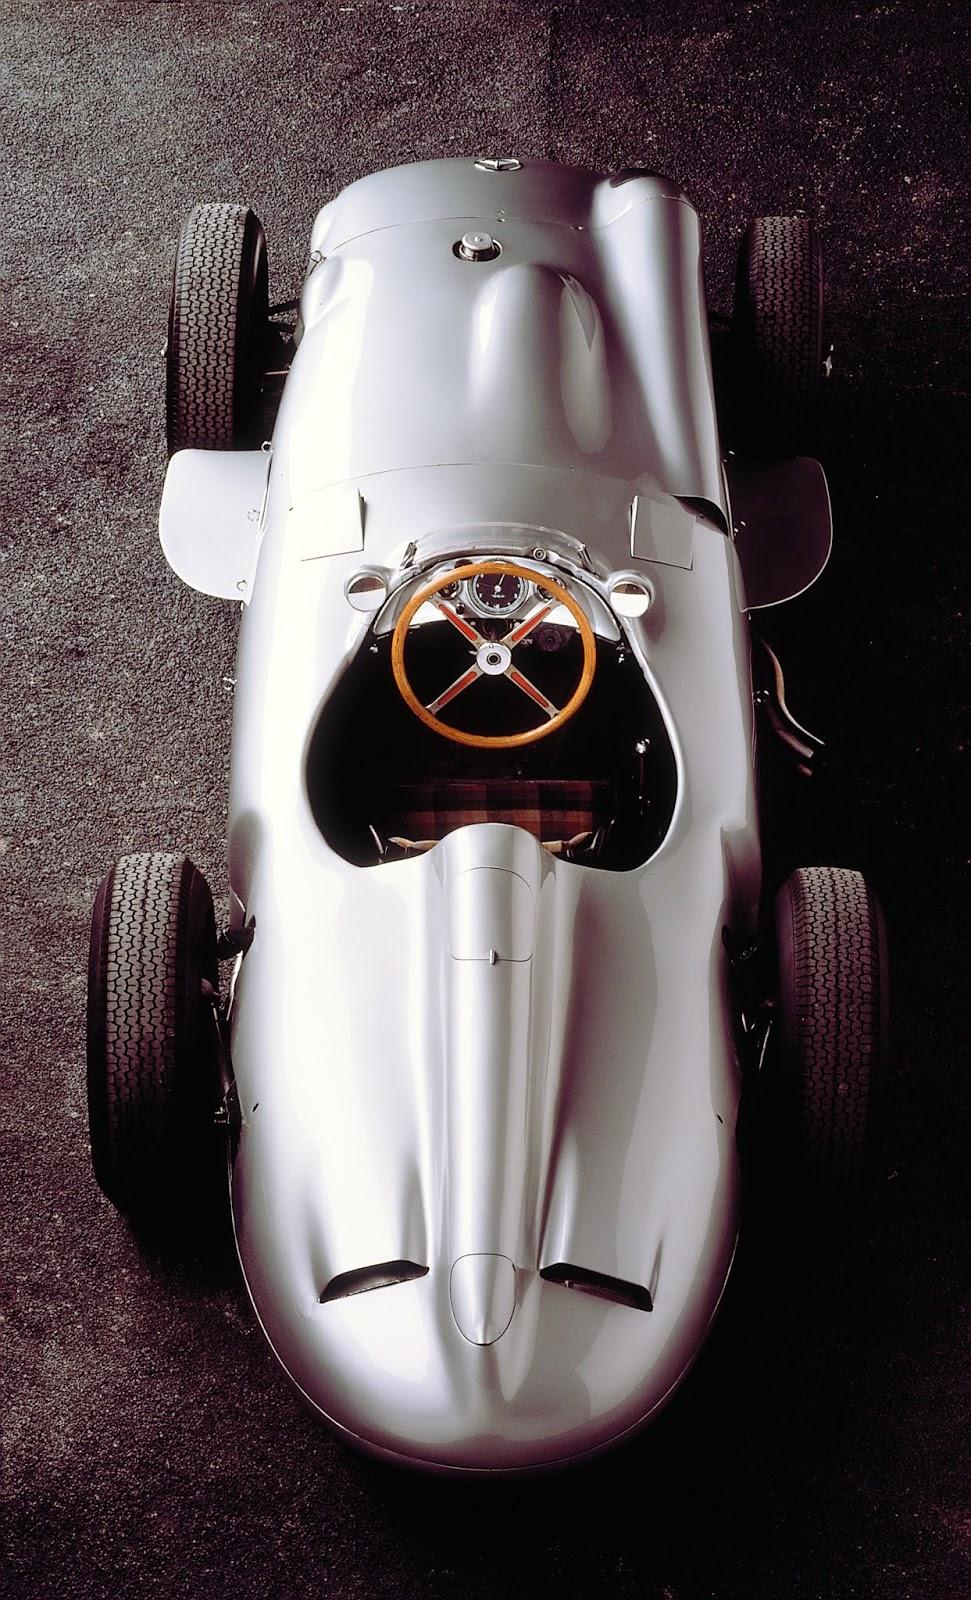 89F153 Ποια είναι η θρυλική 300 SLR 300 SLR, Benz, Mercedes, Mercedes Benz, retrocar, retrocar sunday, vintage, zblog